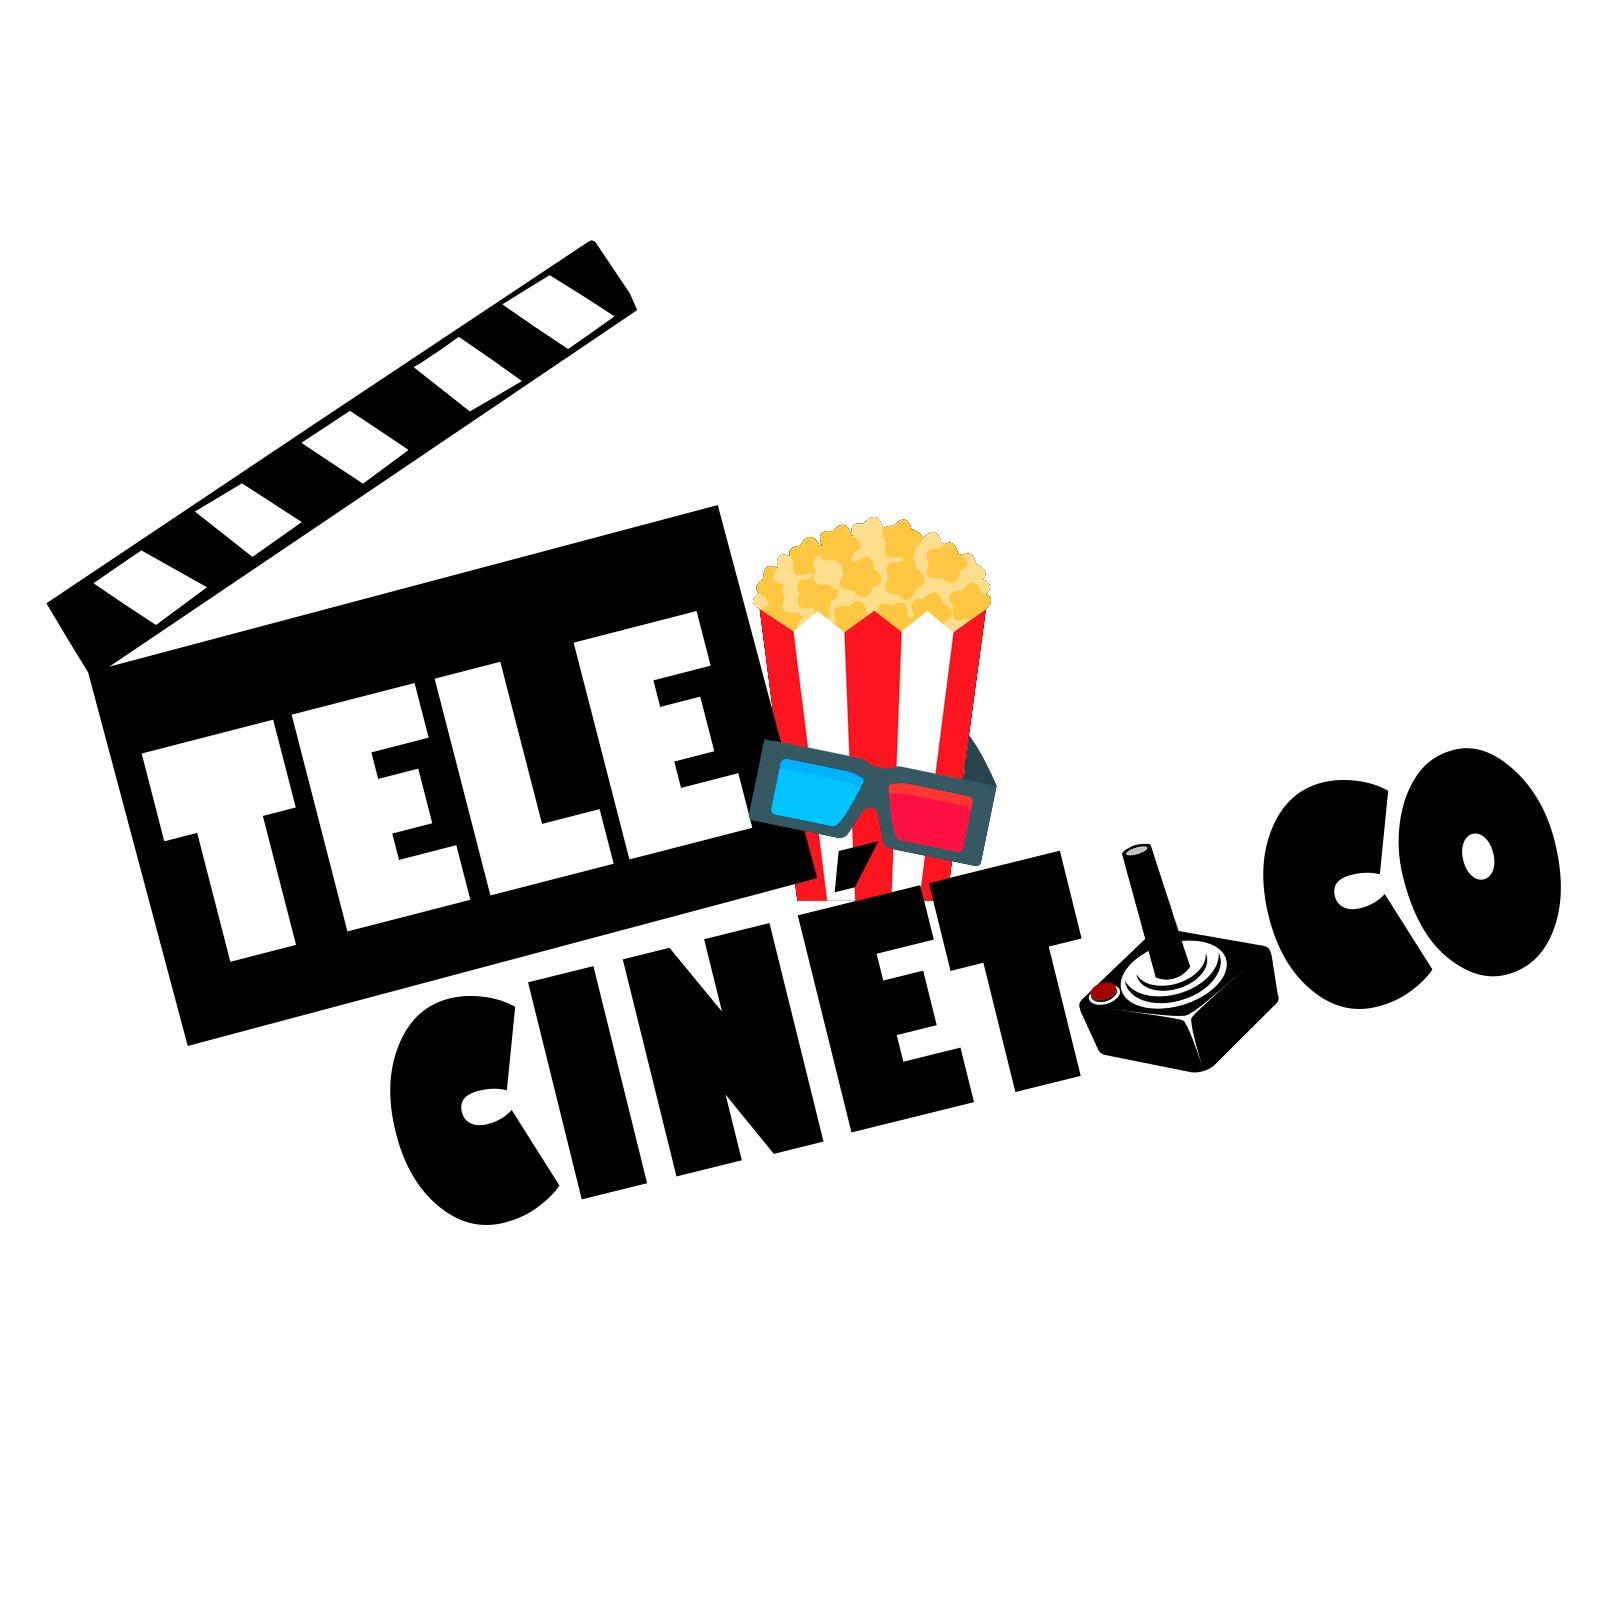 telecinetico tele cinetico twitter